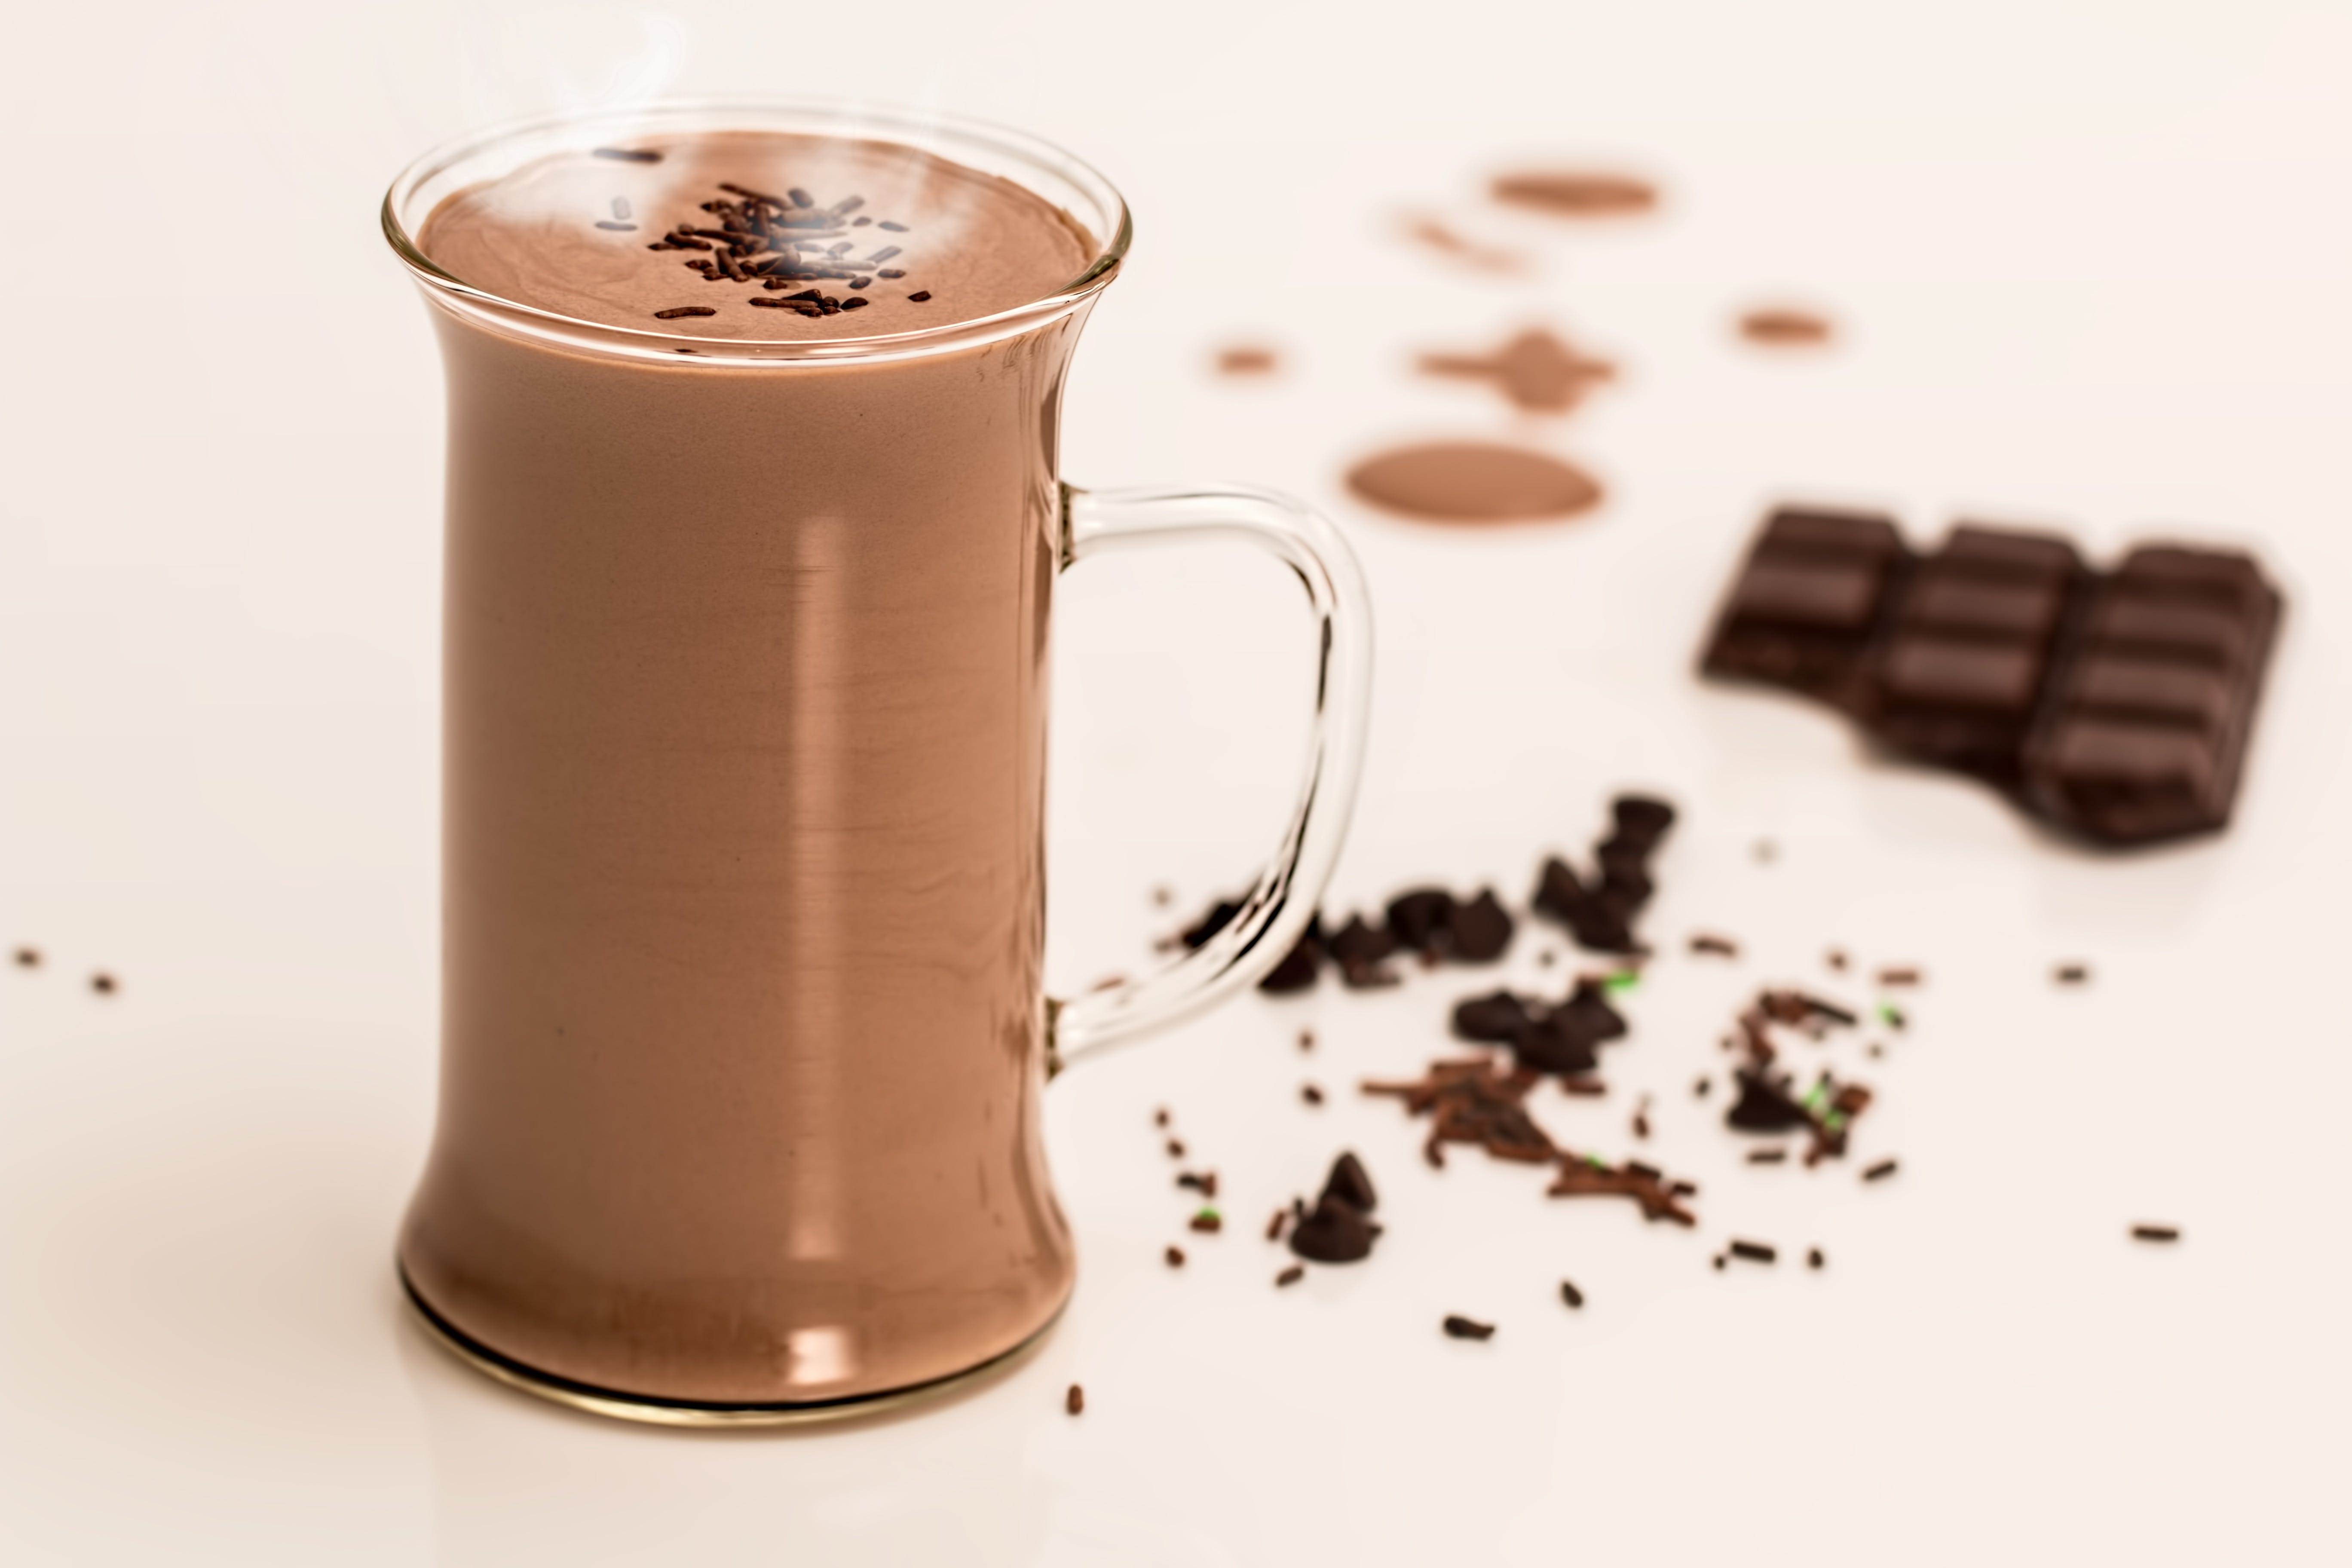 beverage, brown, cacao